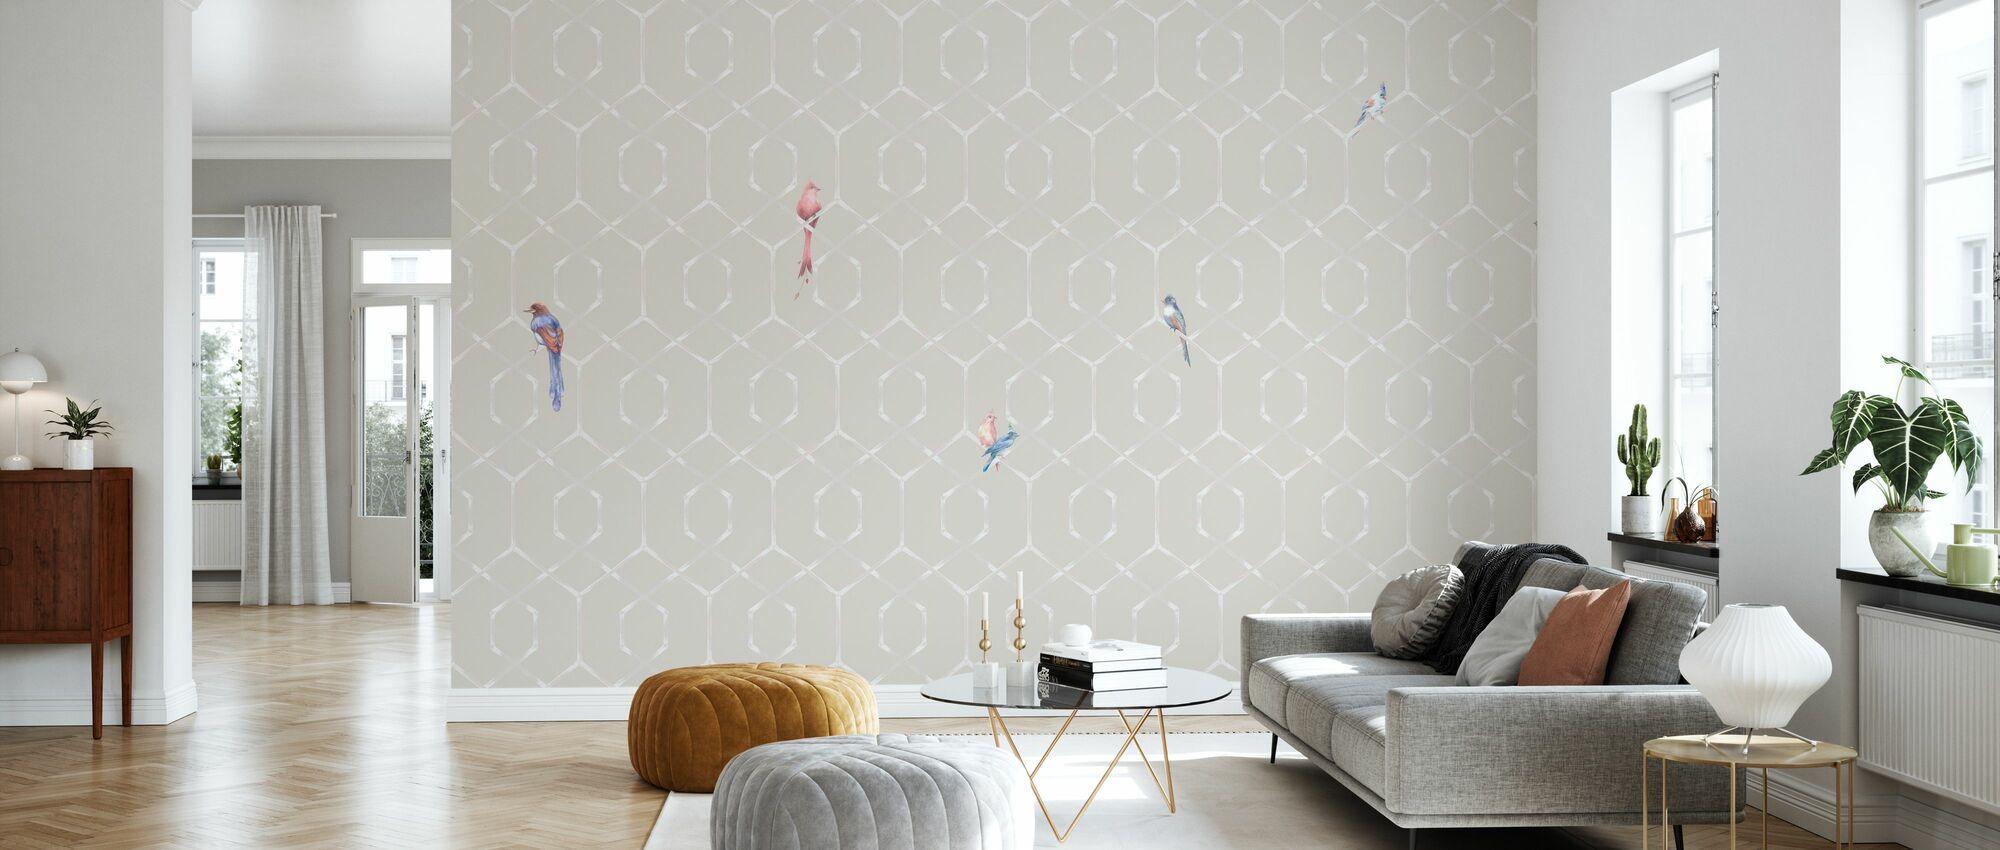 Scalet's Bamboo Web - Powder Pink - Tapete - Wohnzimmer